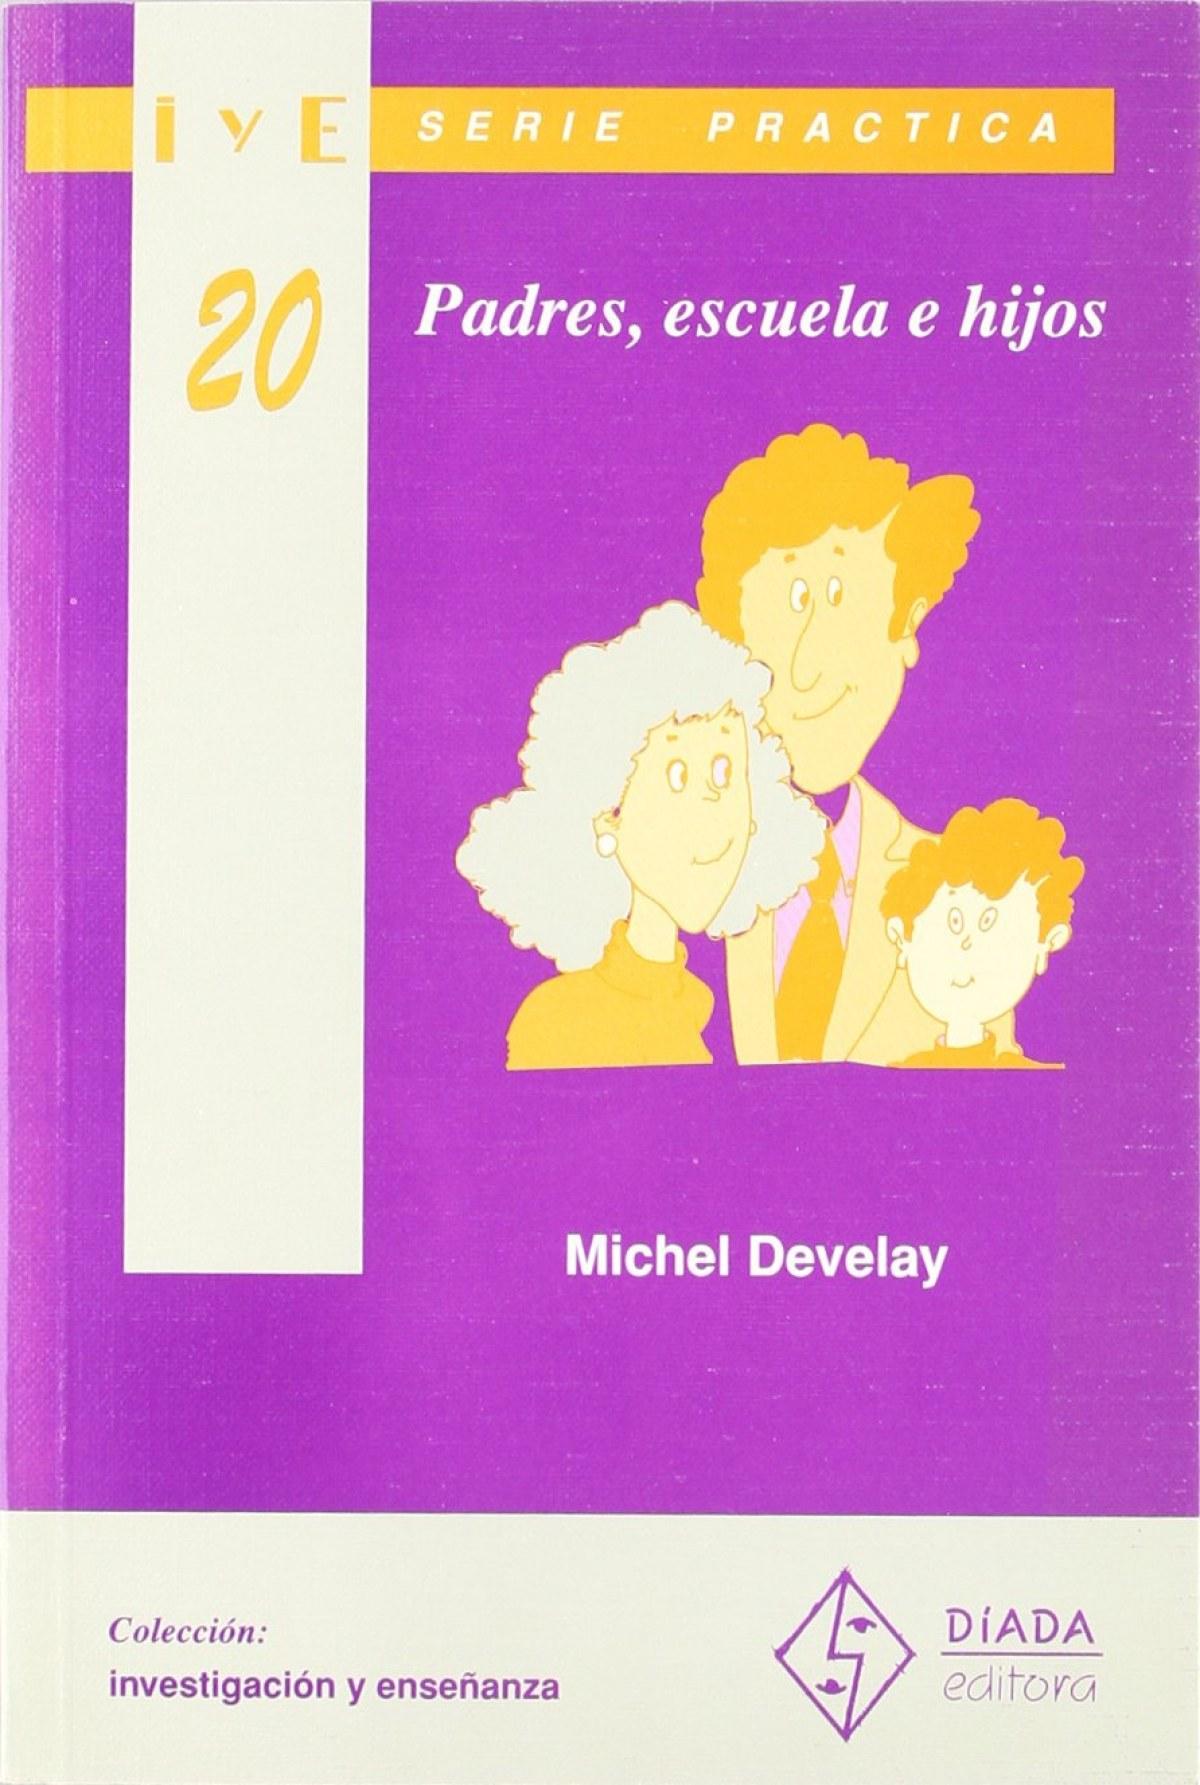 Padres, escuela e hijos Serie práctica - Develay, Michel.